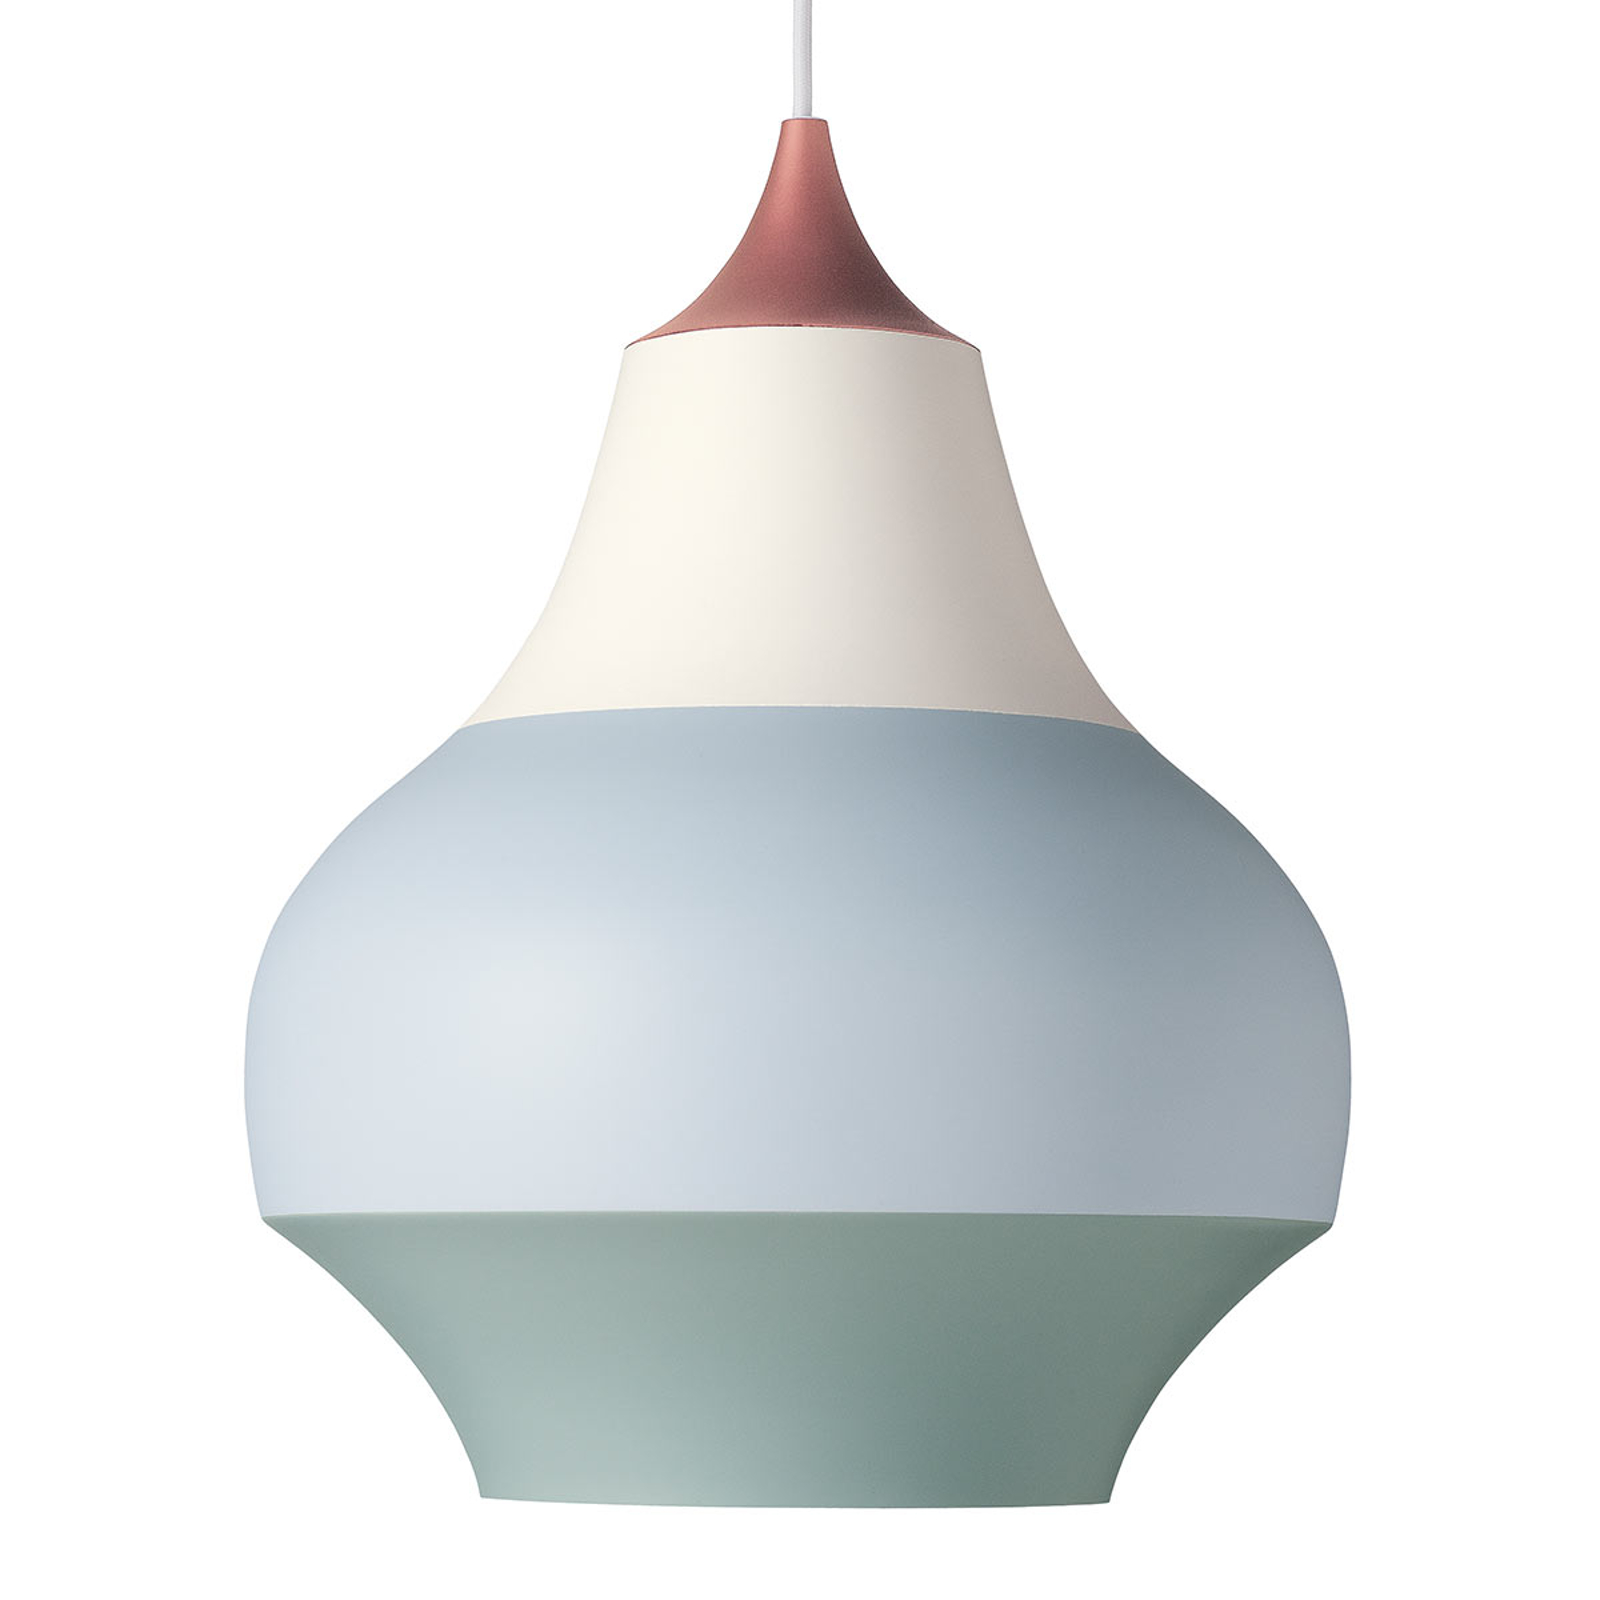 Louis Poulsen Cirque lampada a sospensione 38 cm